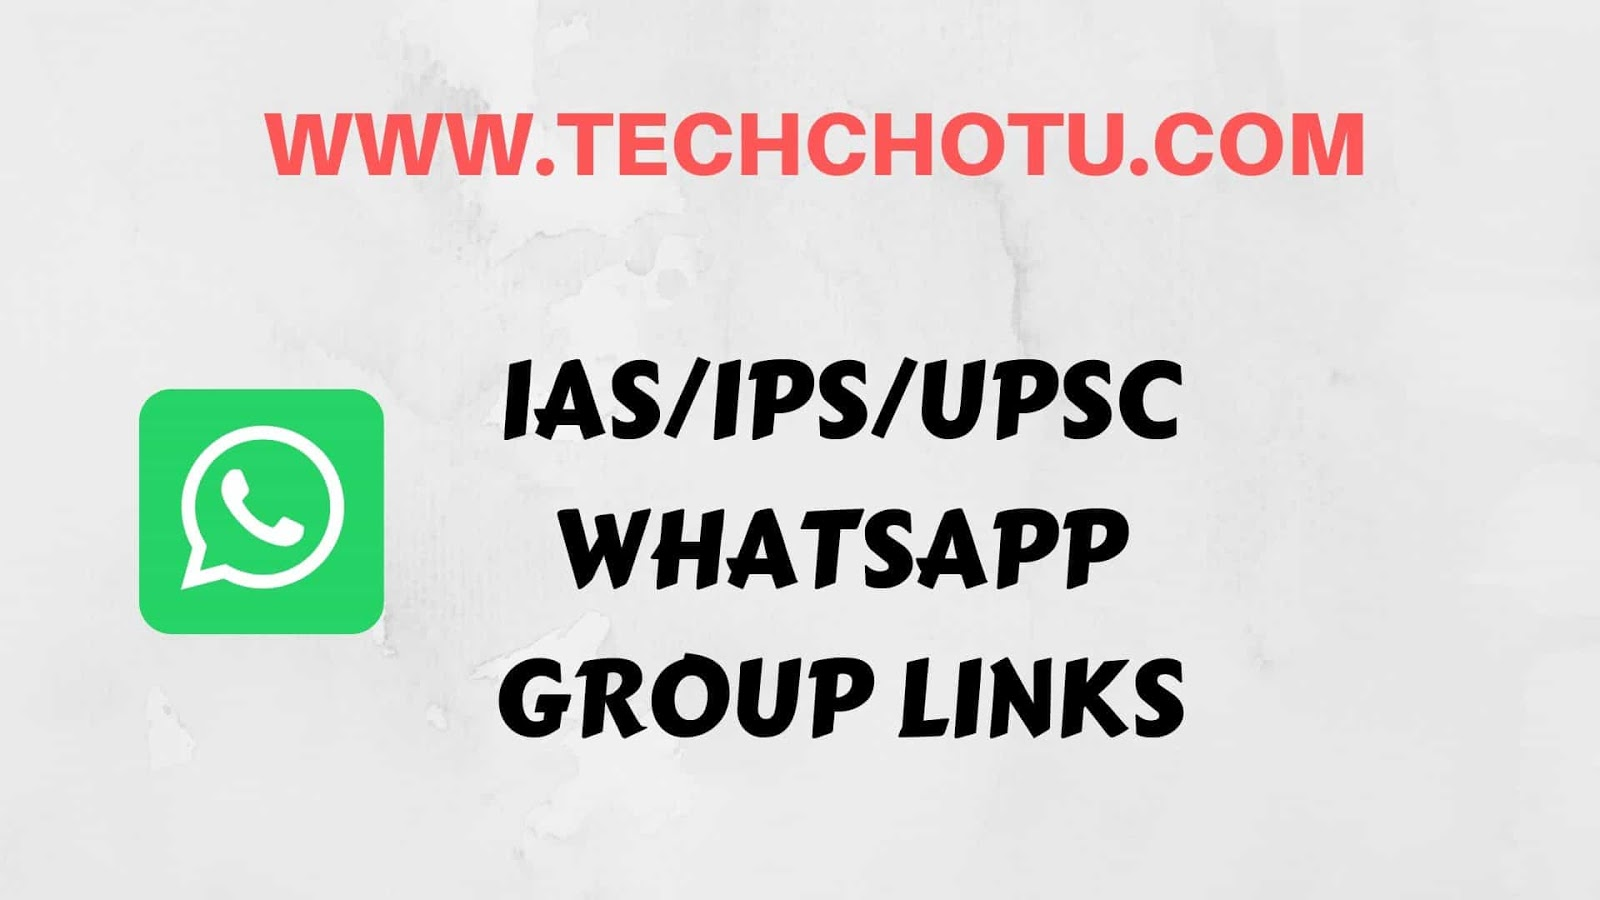 IAS WHATSAPP GROUP LINKS - TECHCHOTU 2019